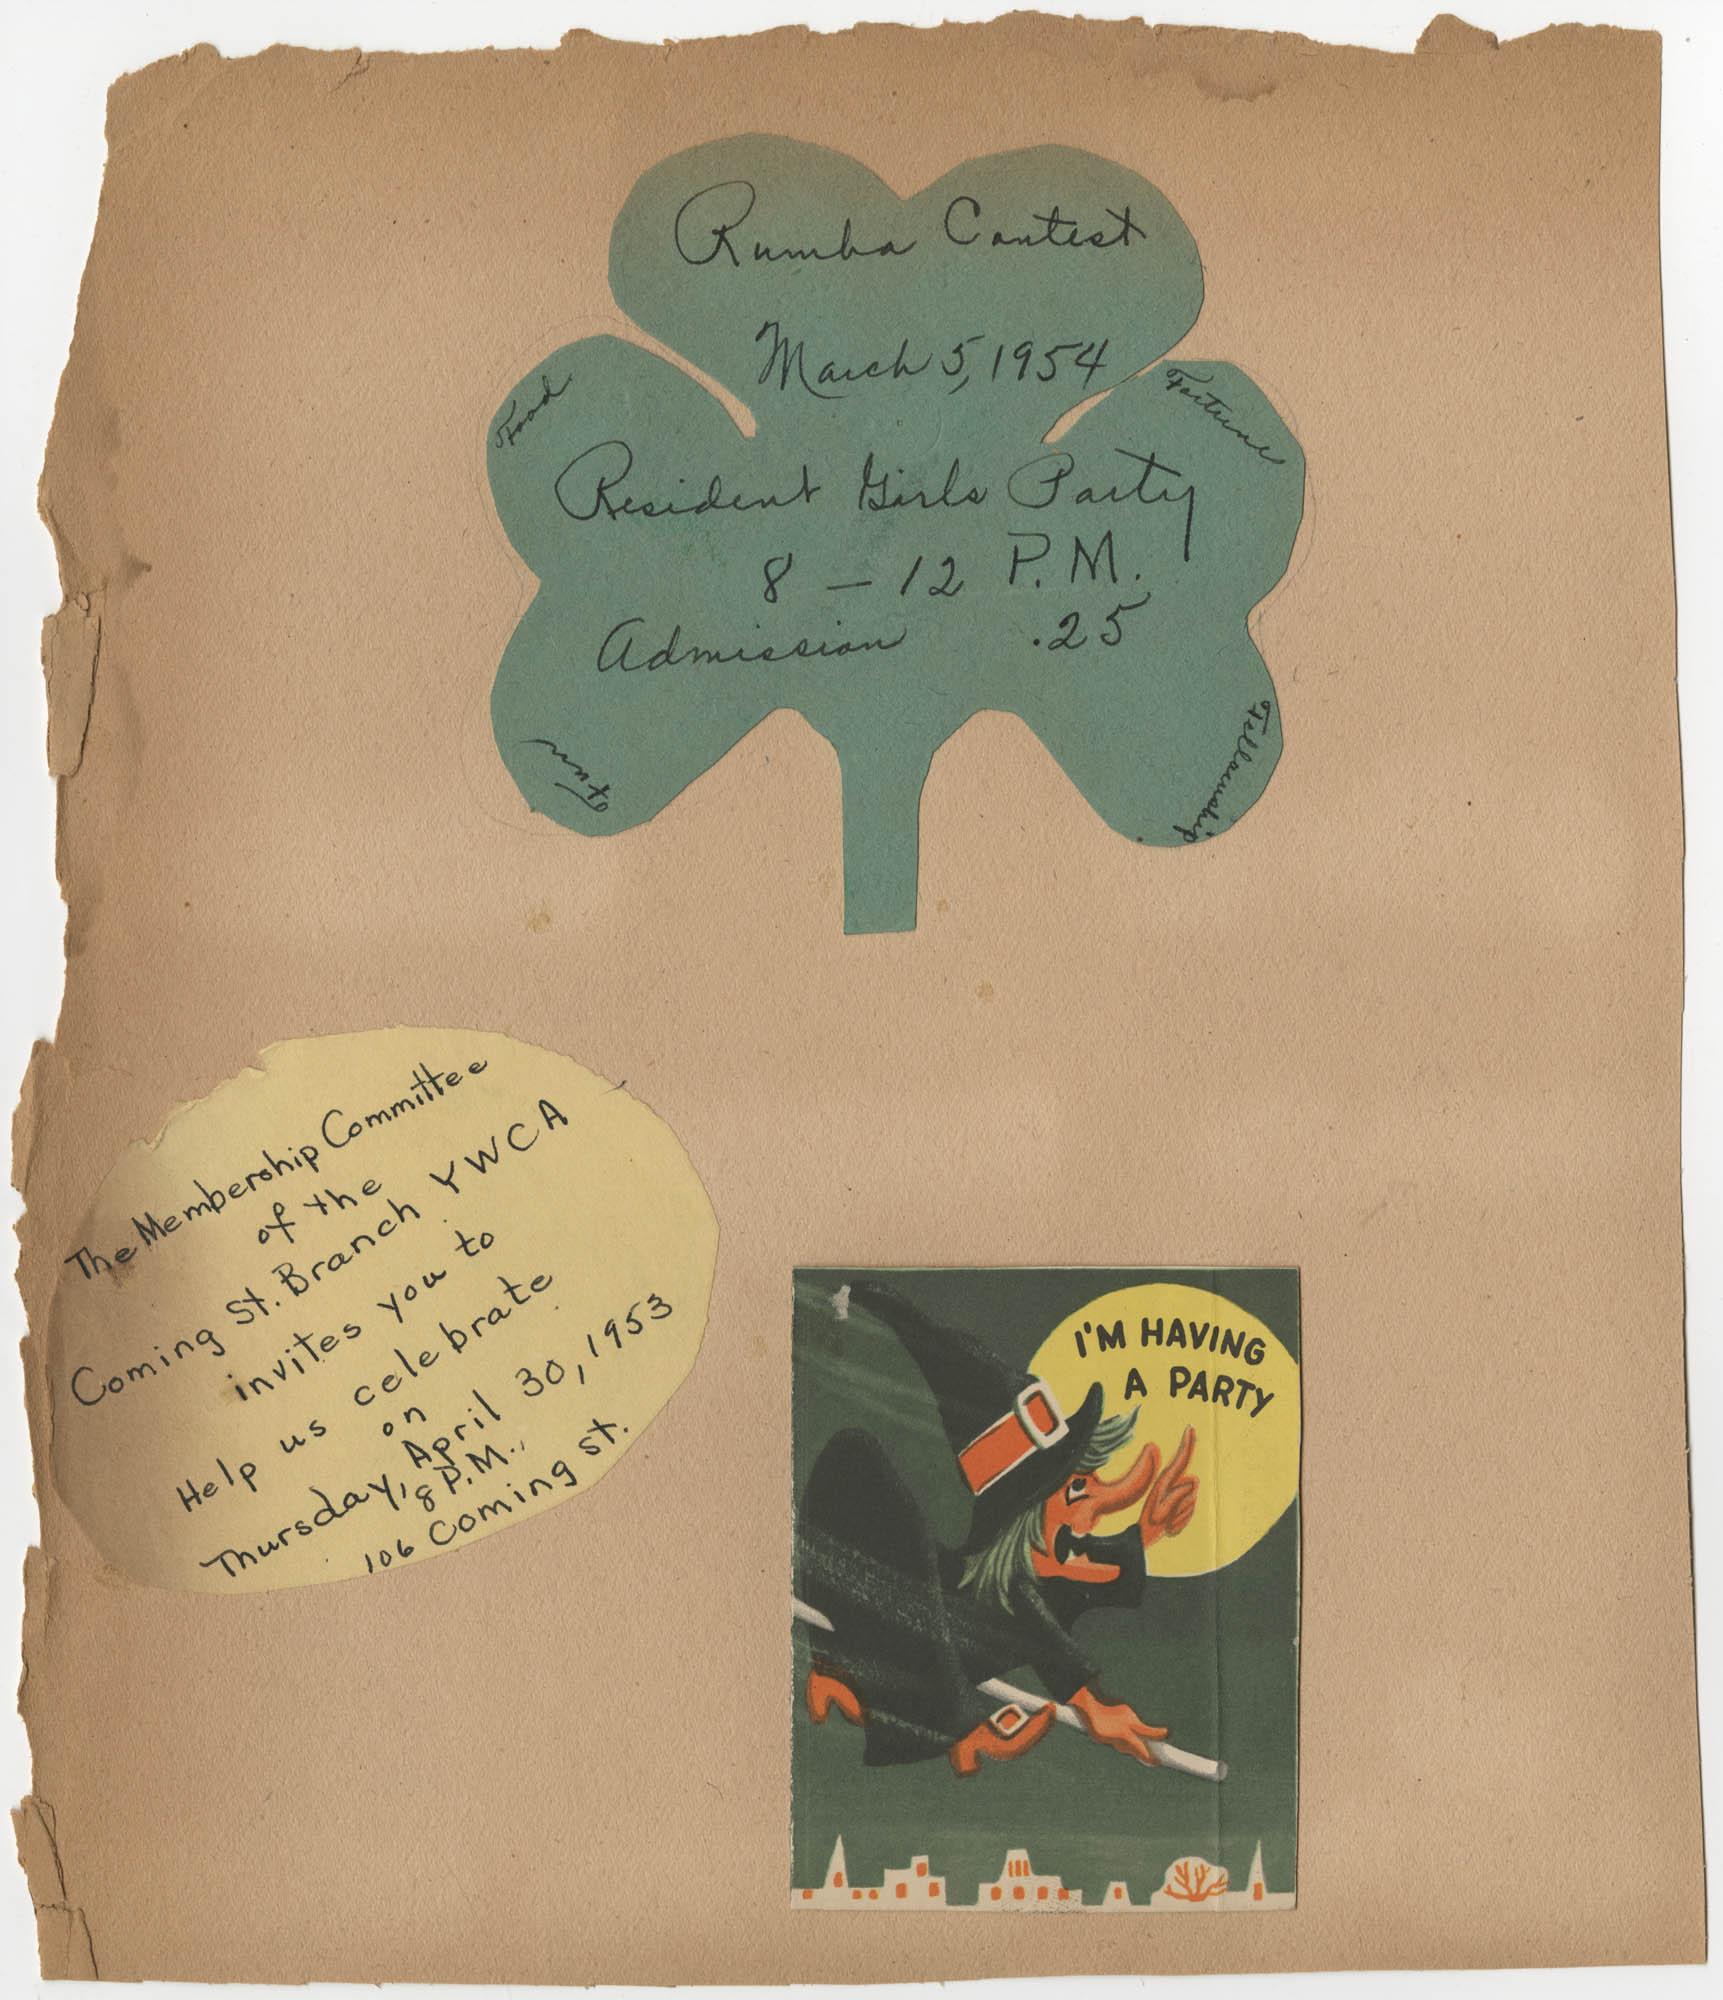 Coming Street Y.W.C.A. Scrapbook, 1953-1957, Page 39 Exterior